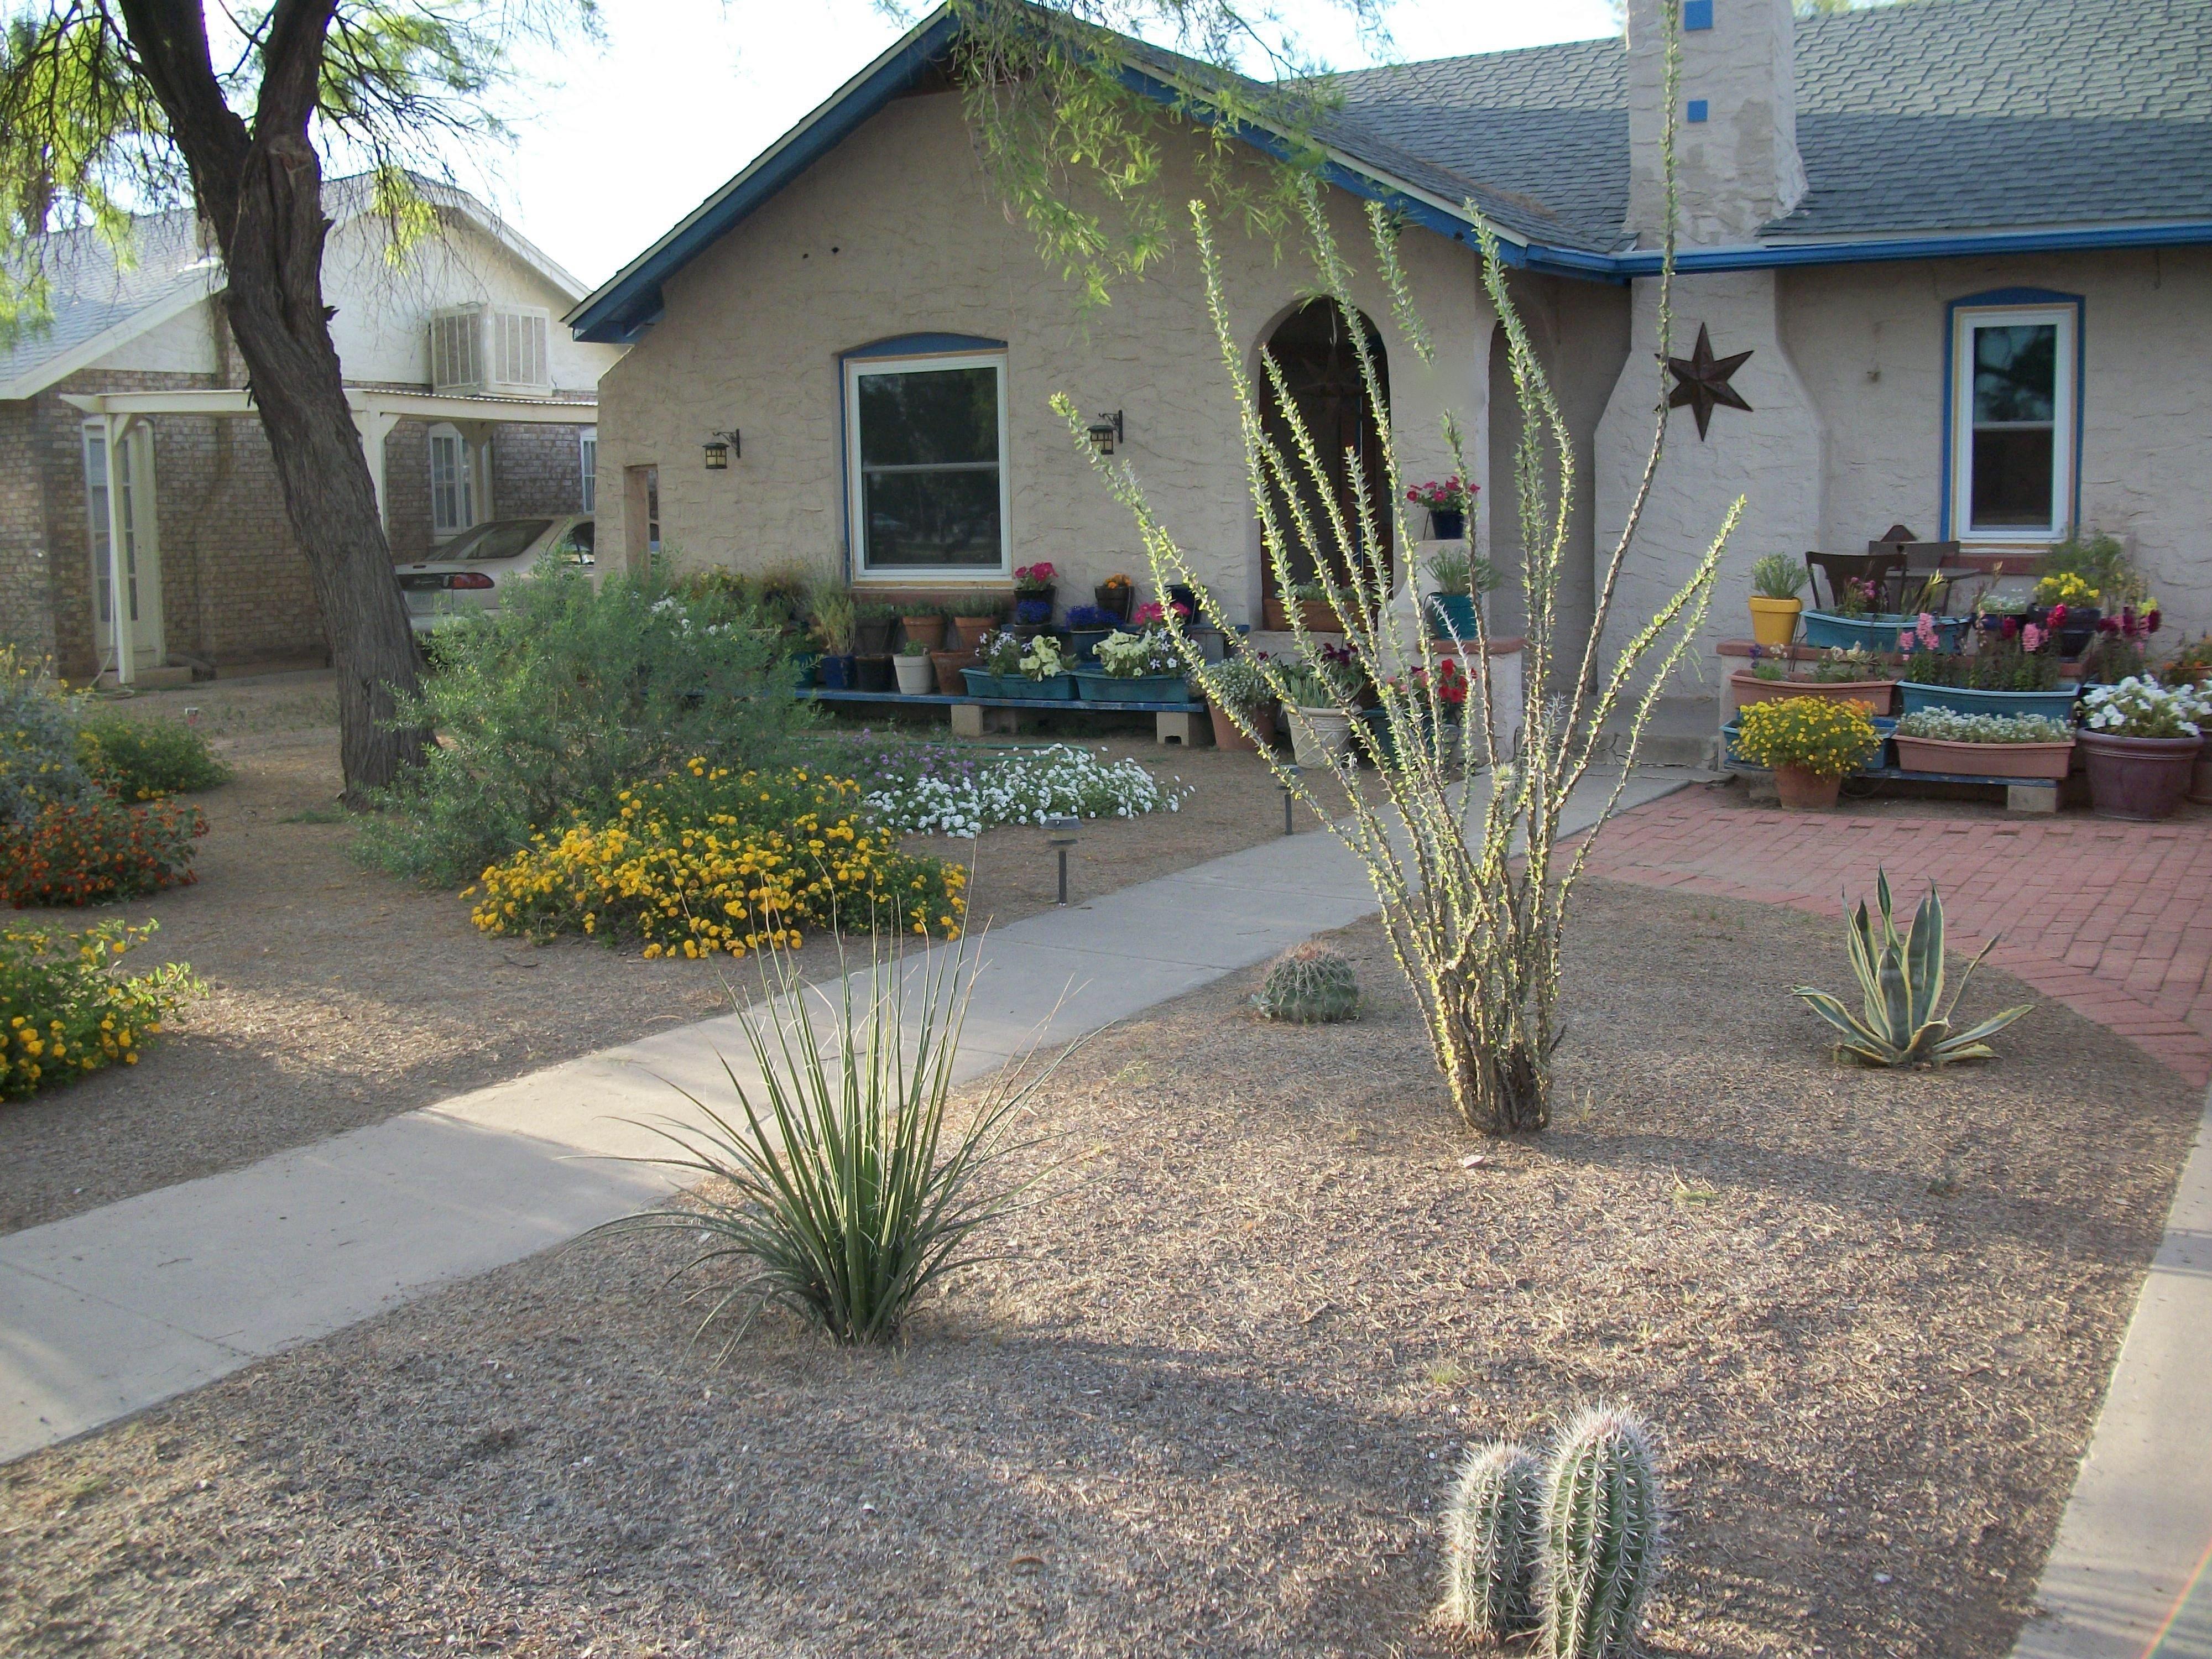 desert garden ideas - unique download front yard desert landscaping